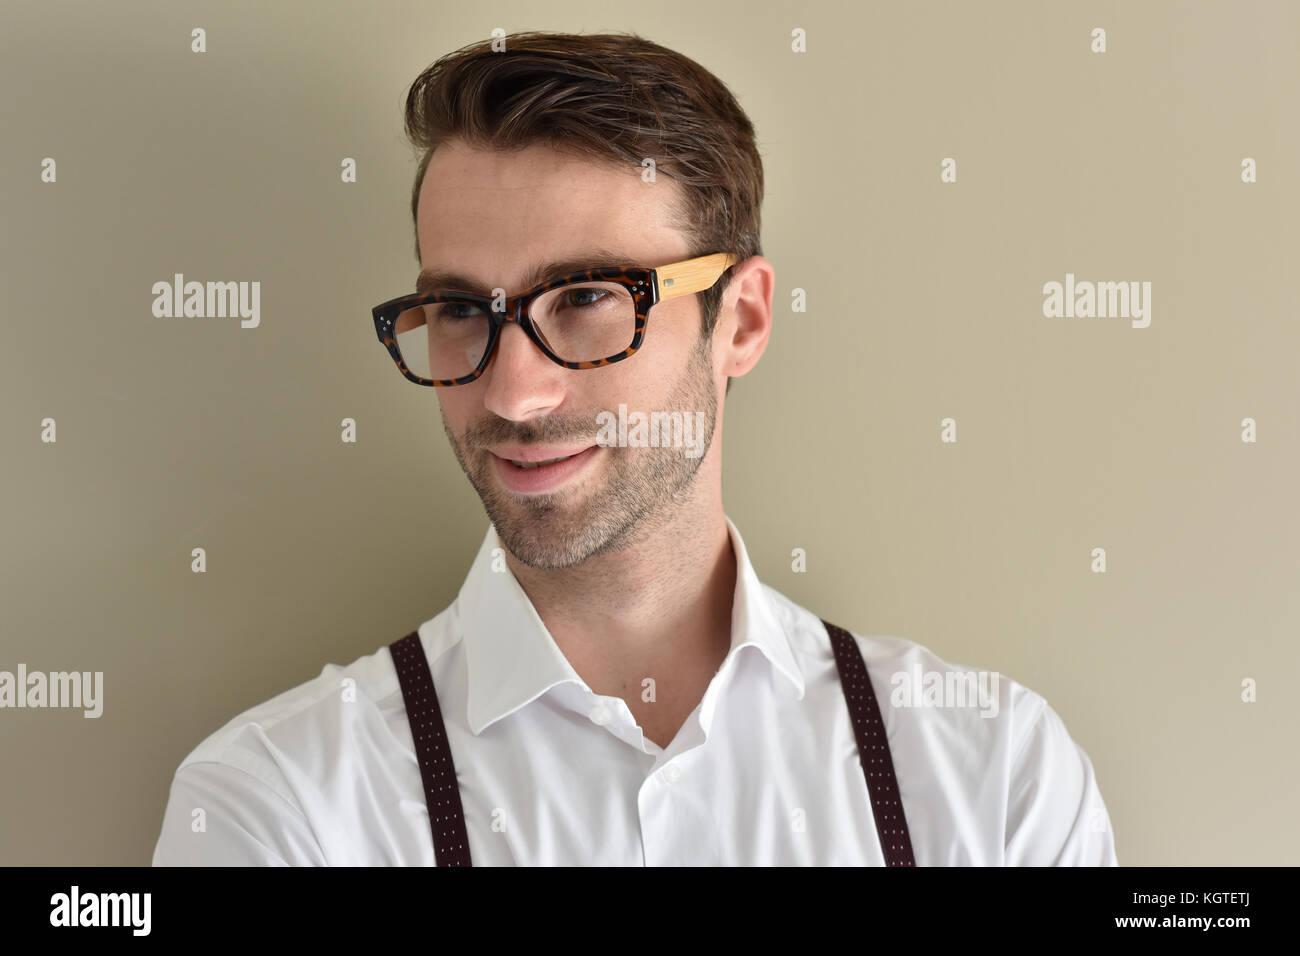 Suspenders Stock Photos & Suspenders Stock Images - Alamy